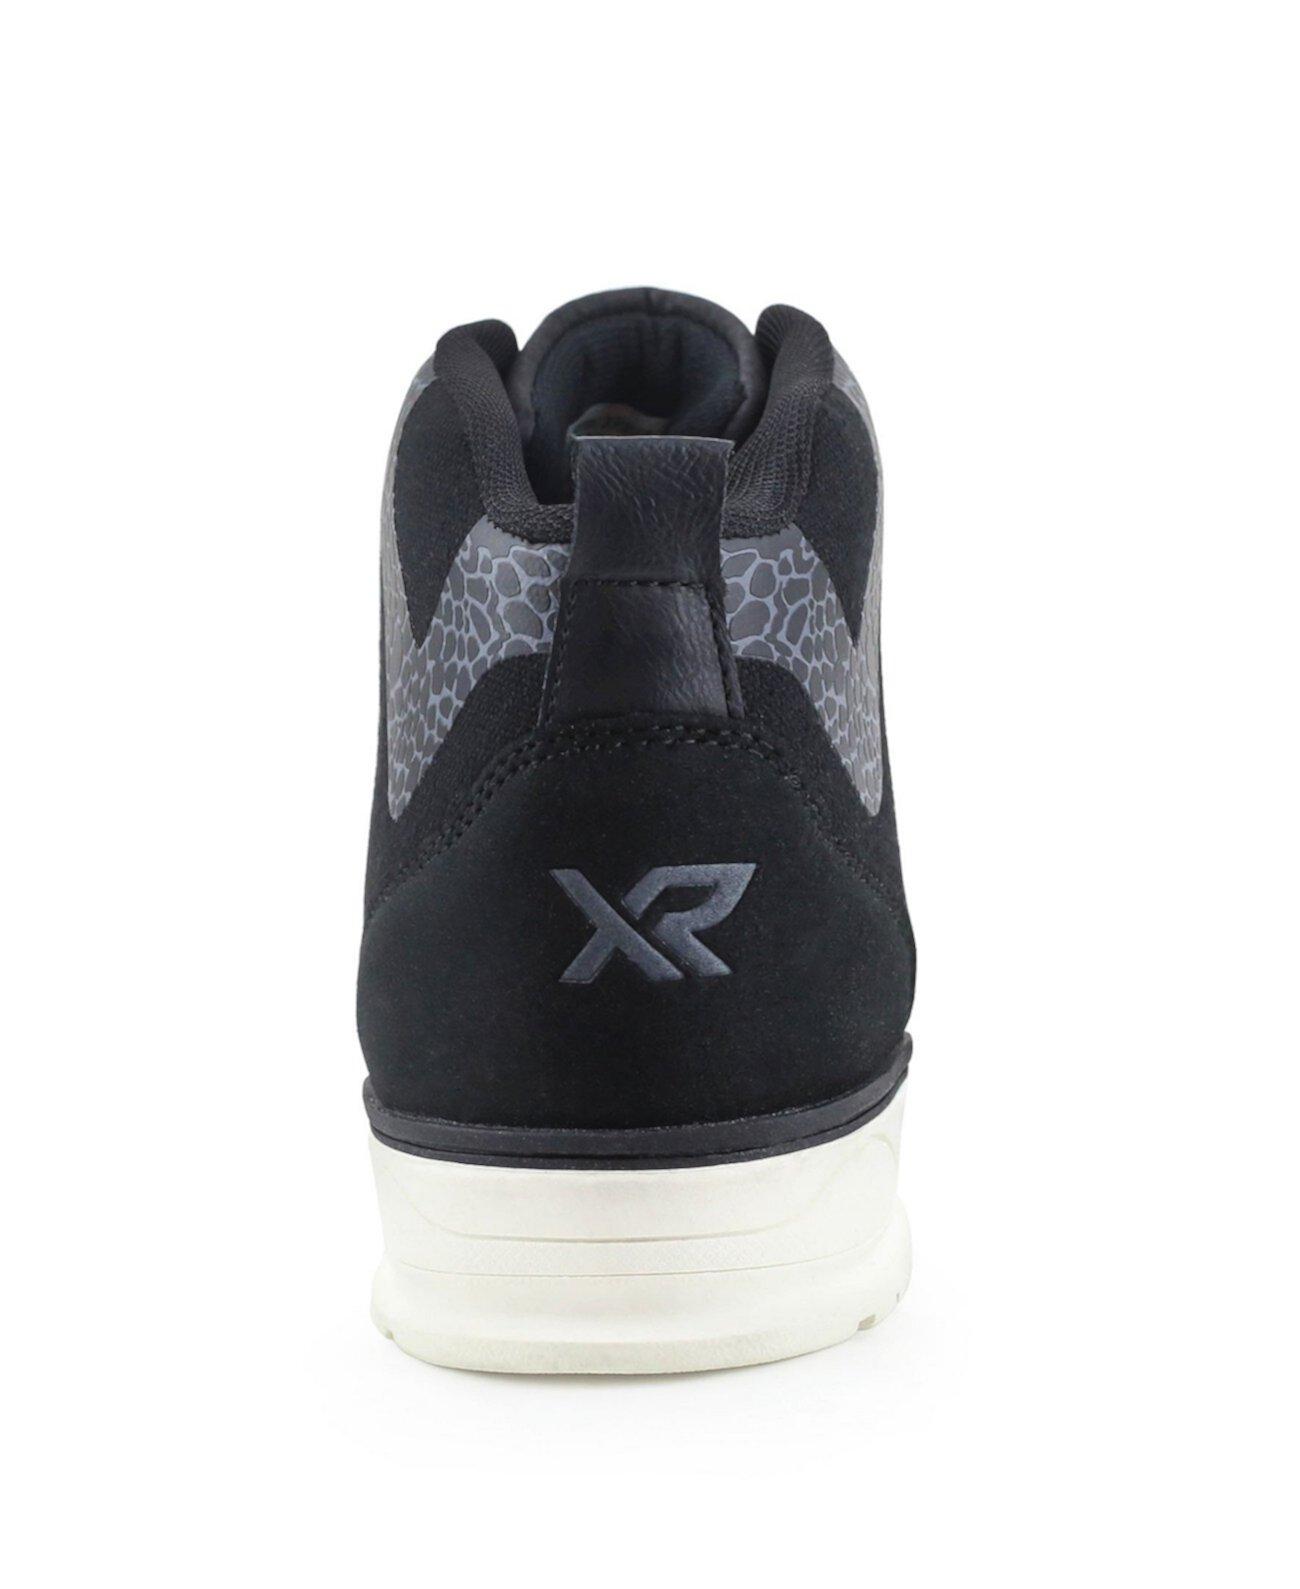 Мужские кроссовки Ranger High-Top XRAY